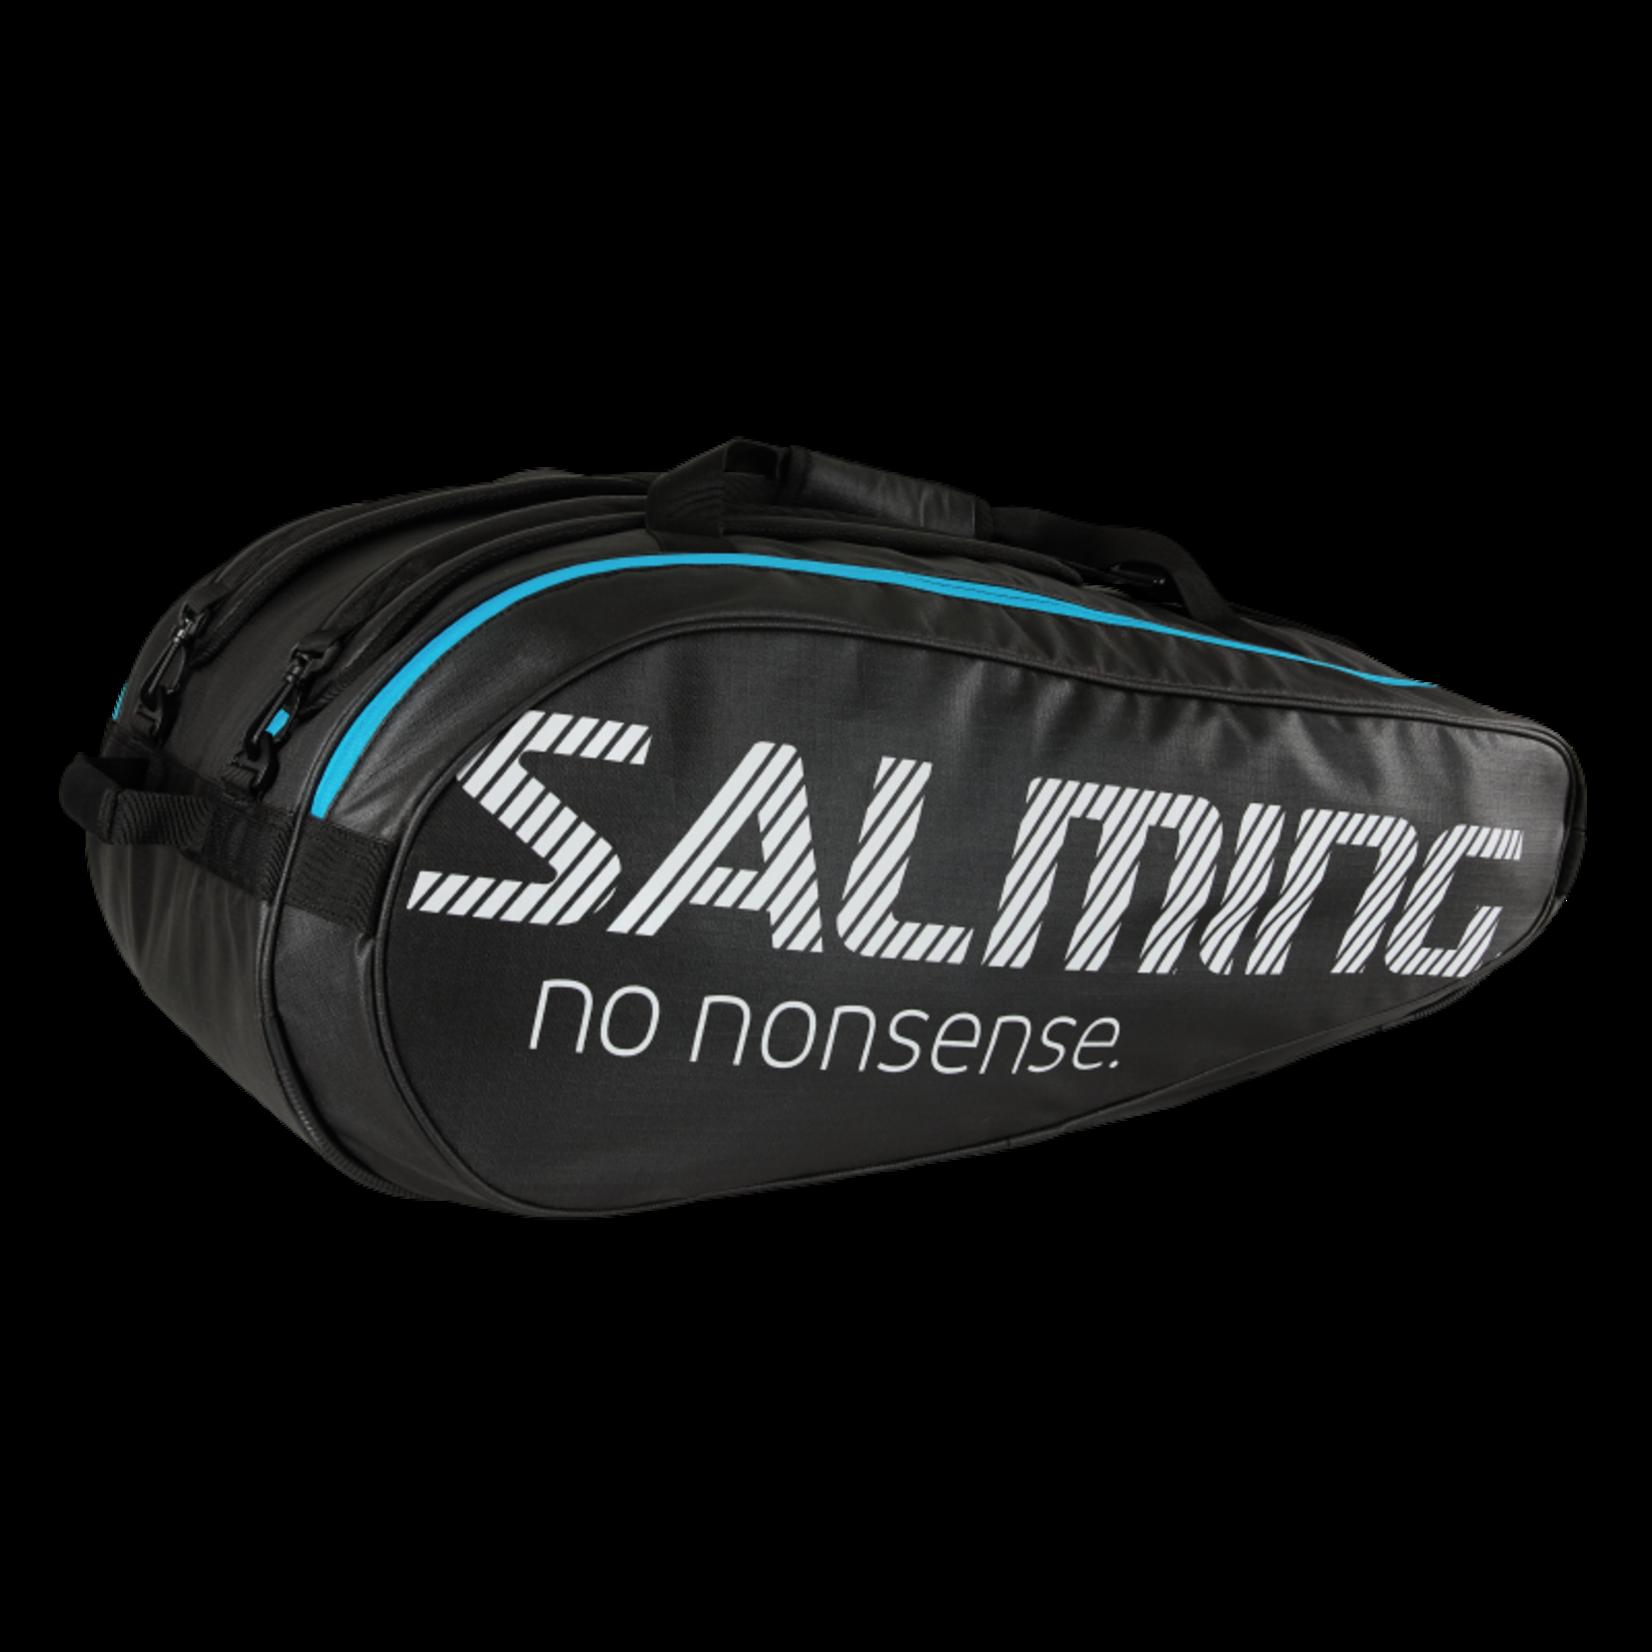 Salming ProTour 12R Racket tas